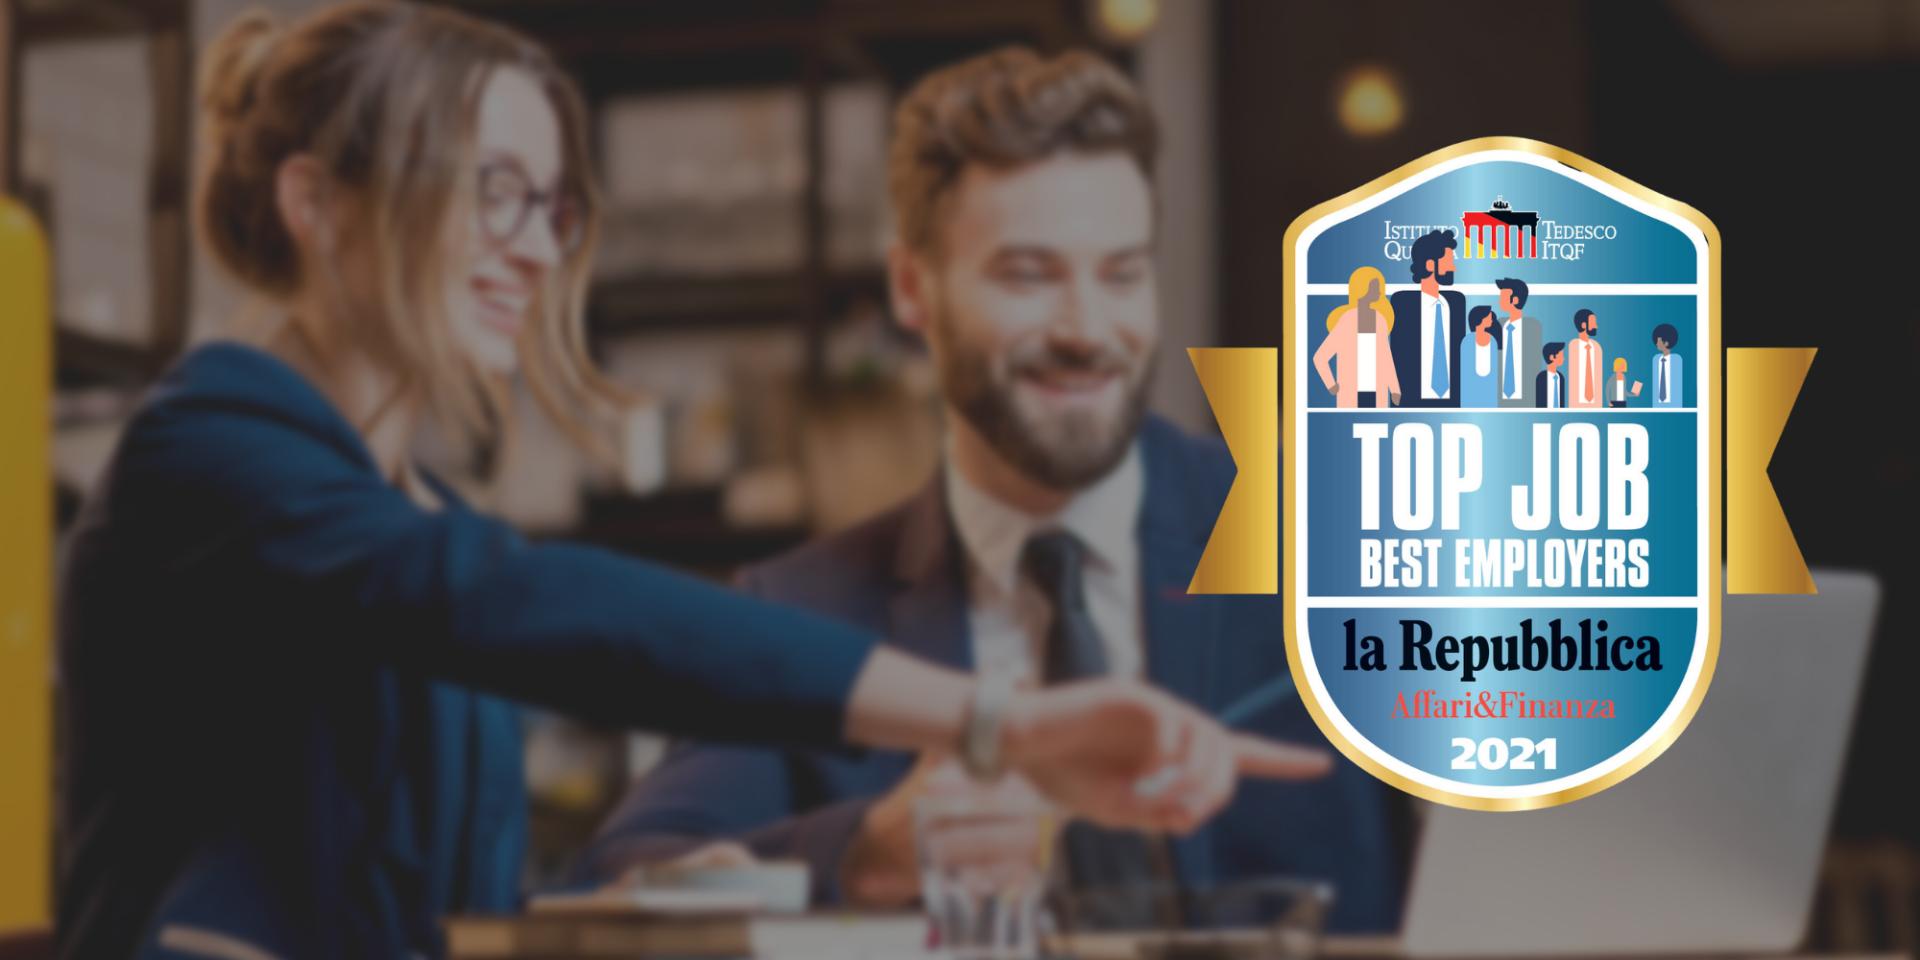 Banca Generali is 2021 Best Employer